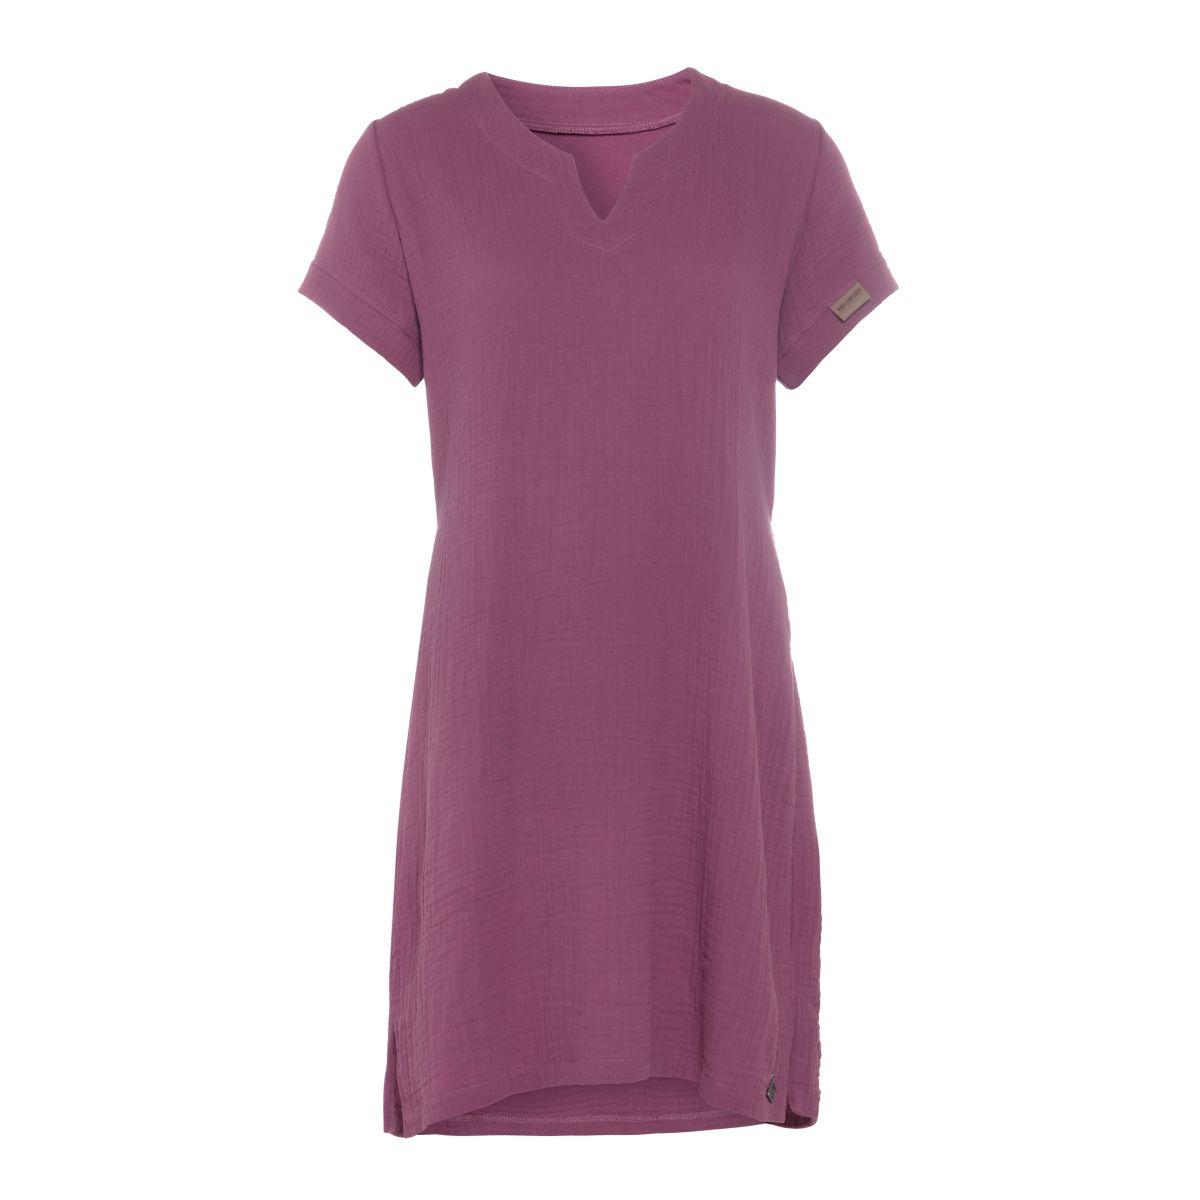 knit factory kf15012004349 indy jurk purple s 1